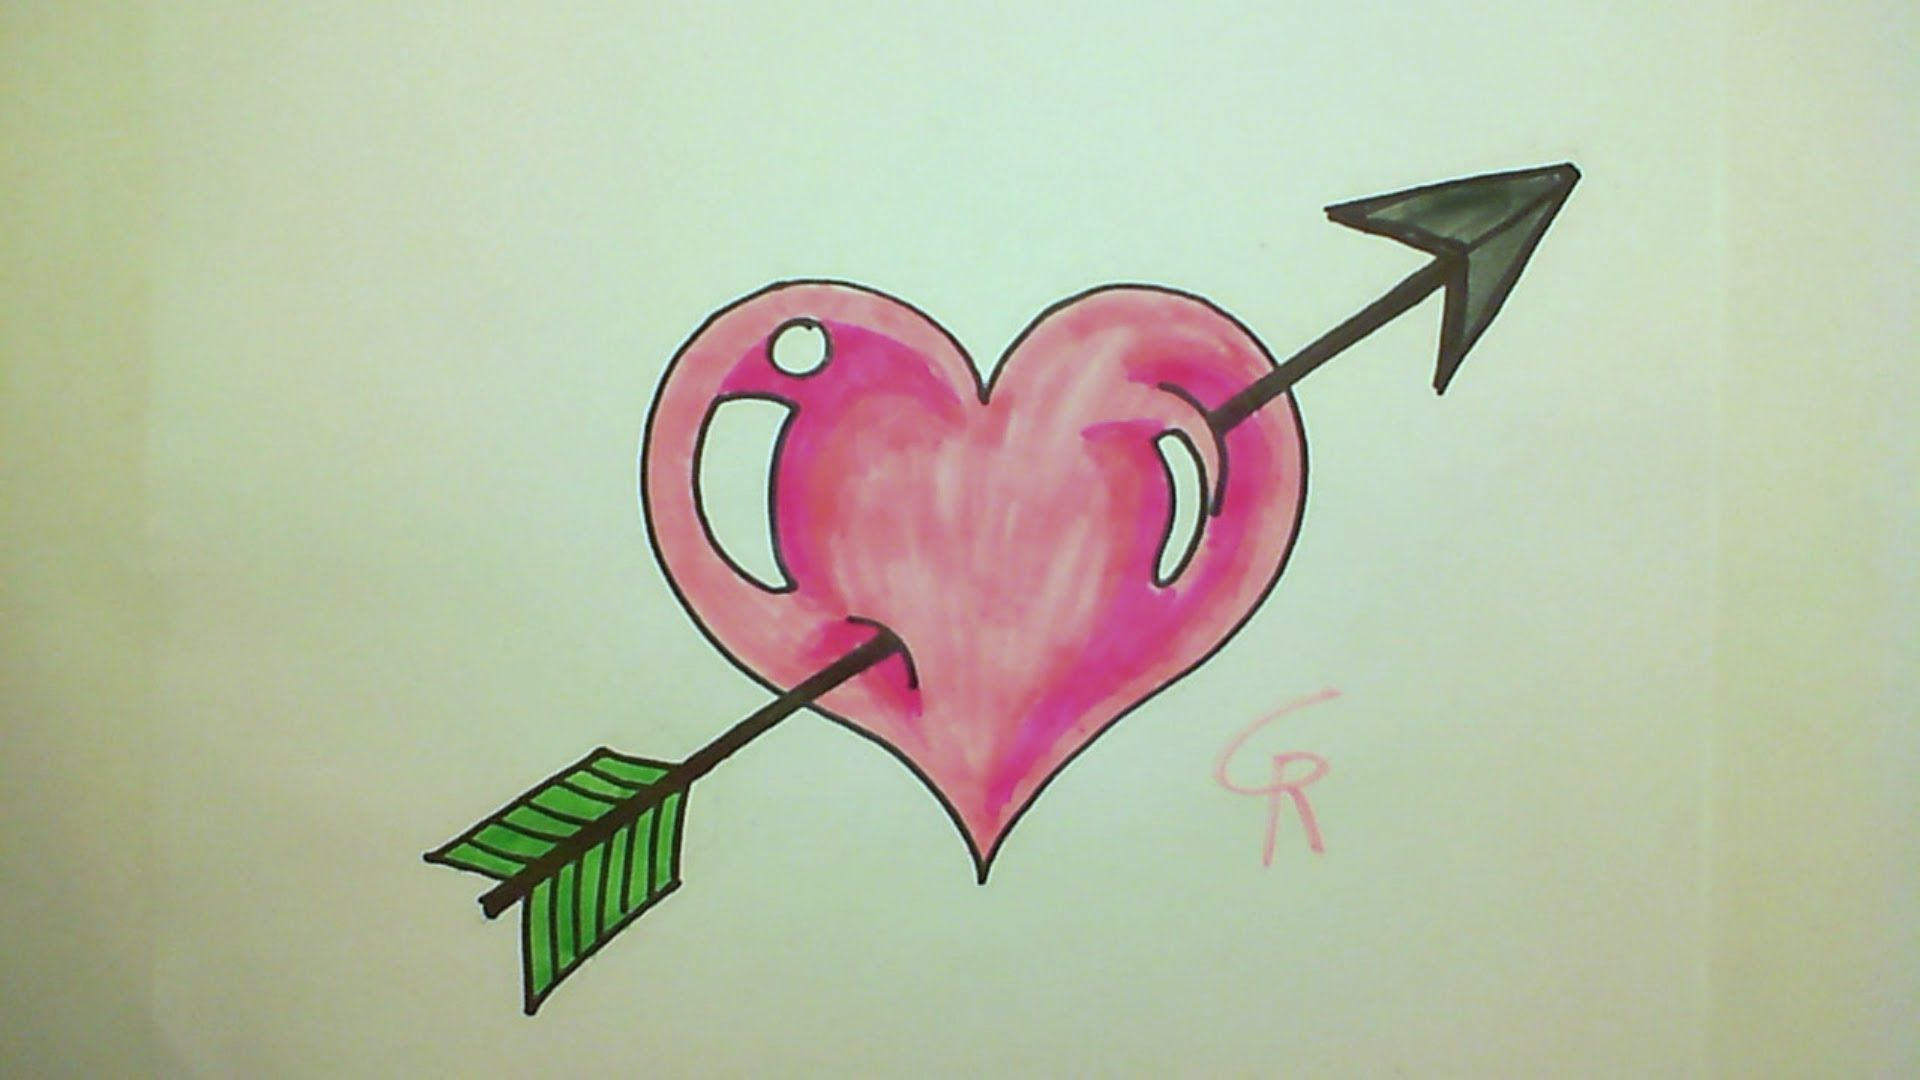 Fun2draw Valentines Day Cute Heart Drawings Www Galleryneed Com